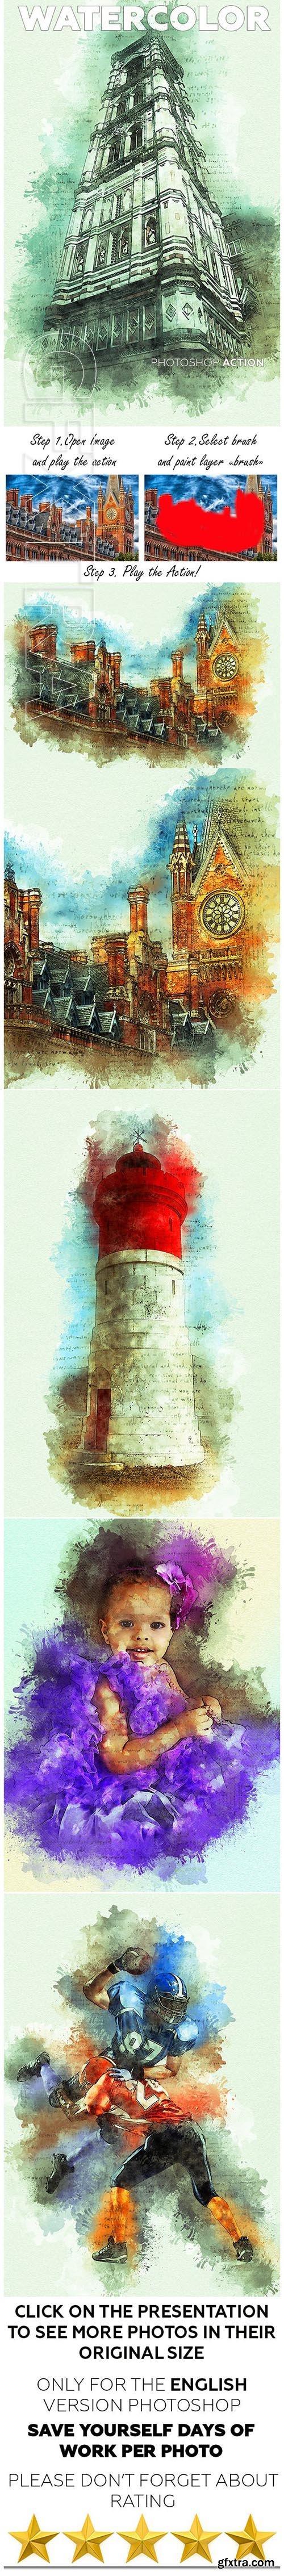 GraphicRiver - Watercolor Photoshop Action 23142840